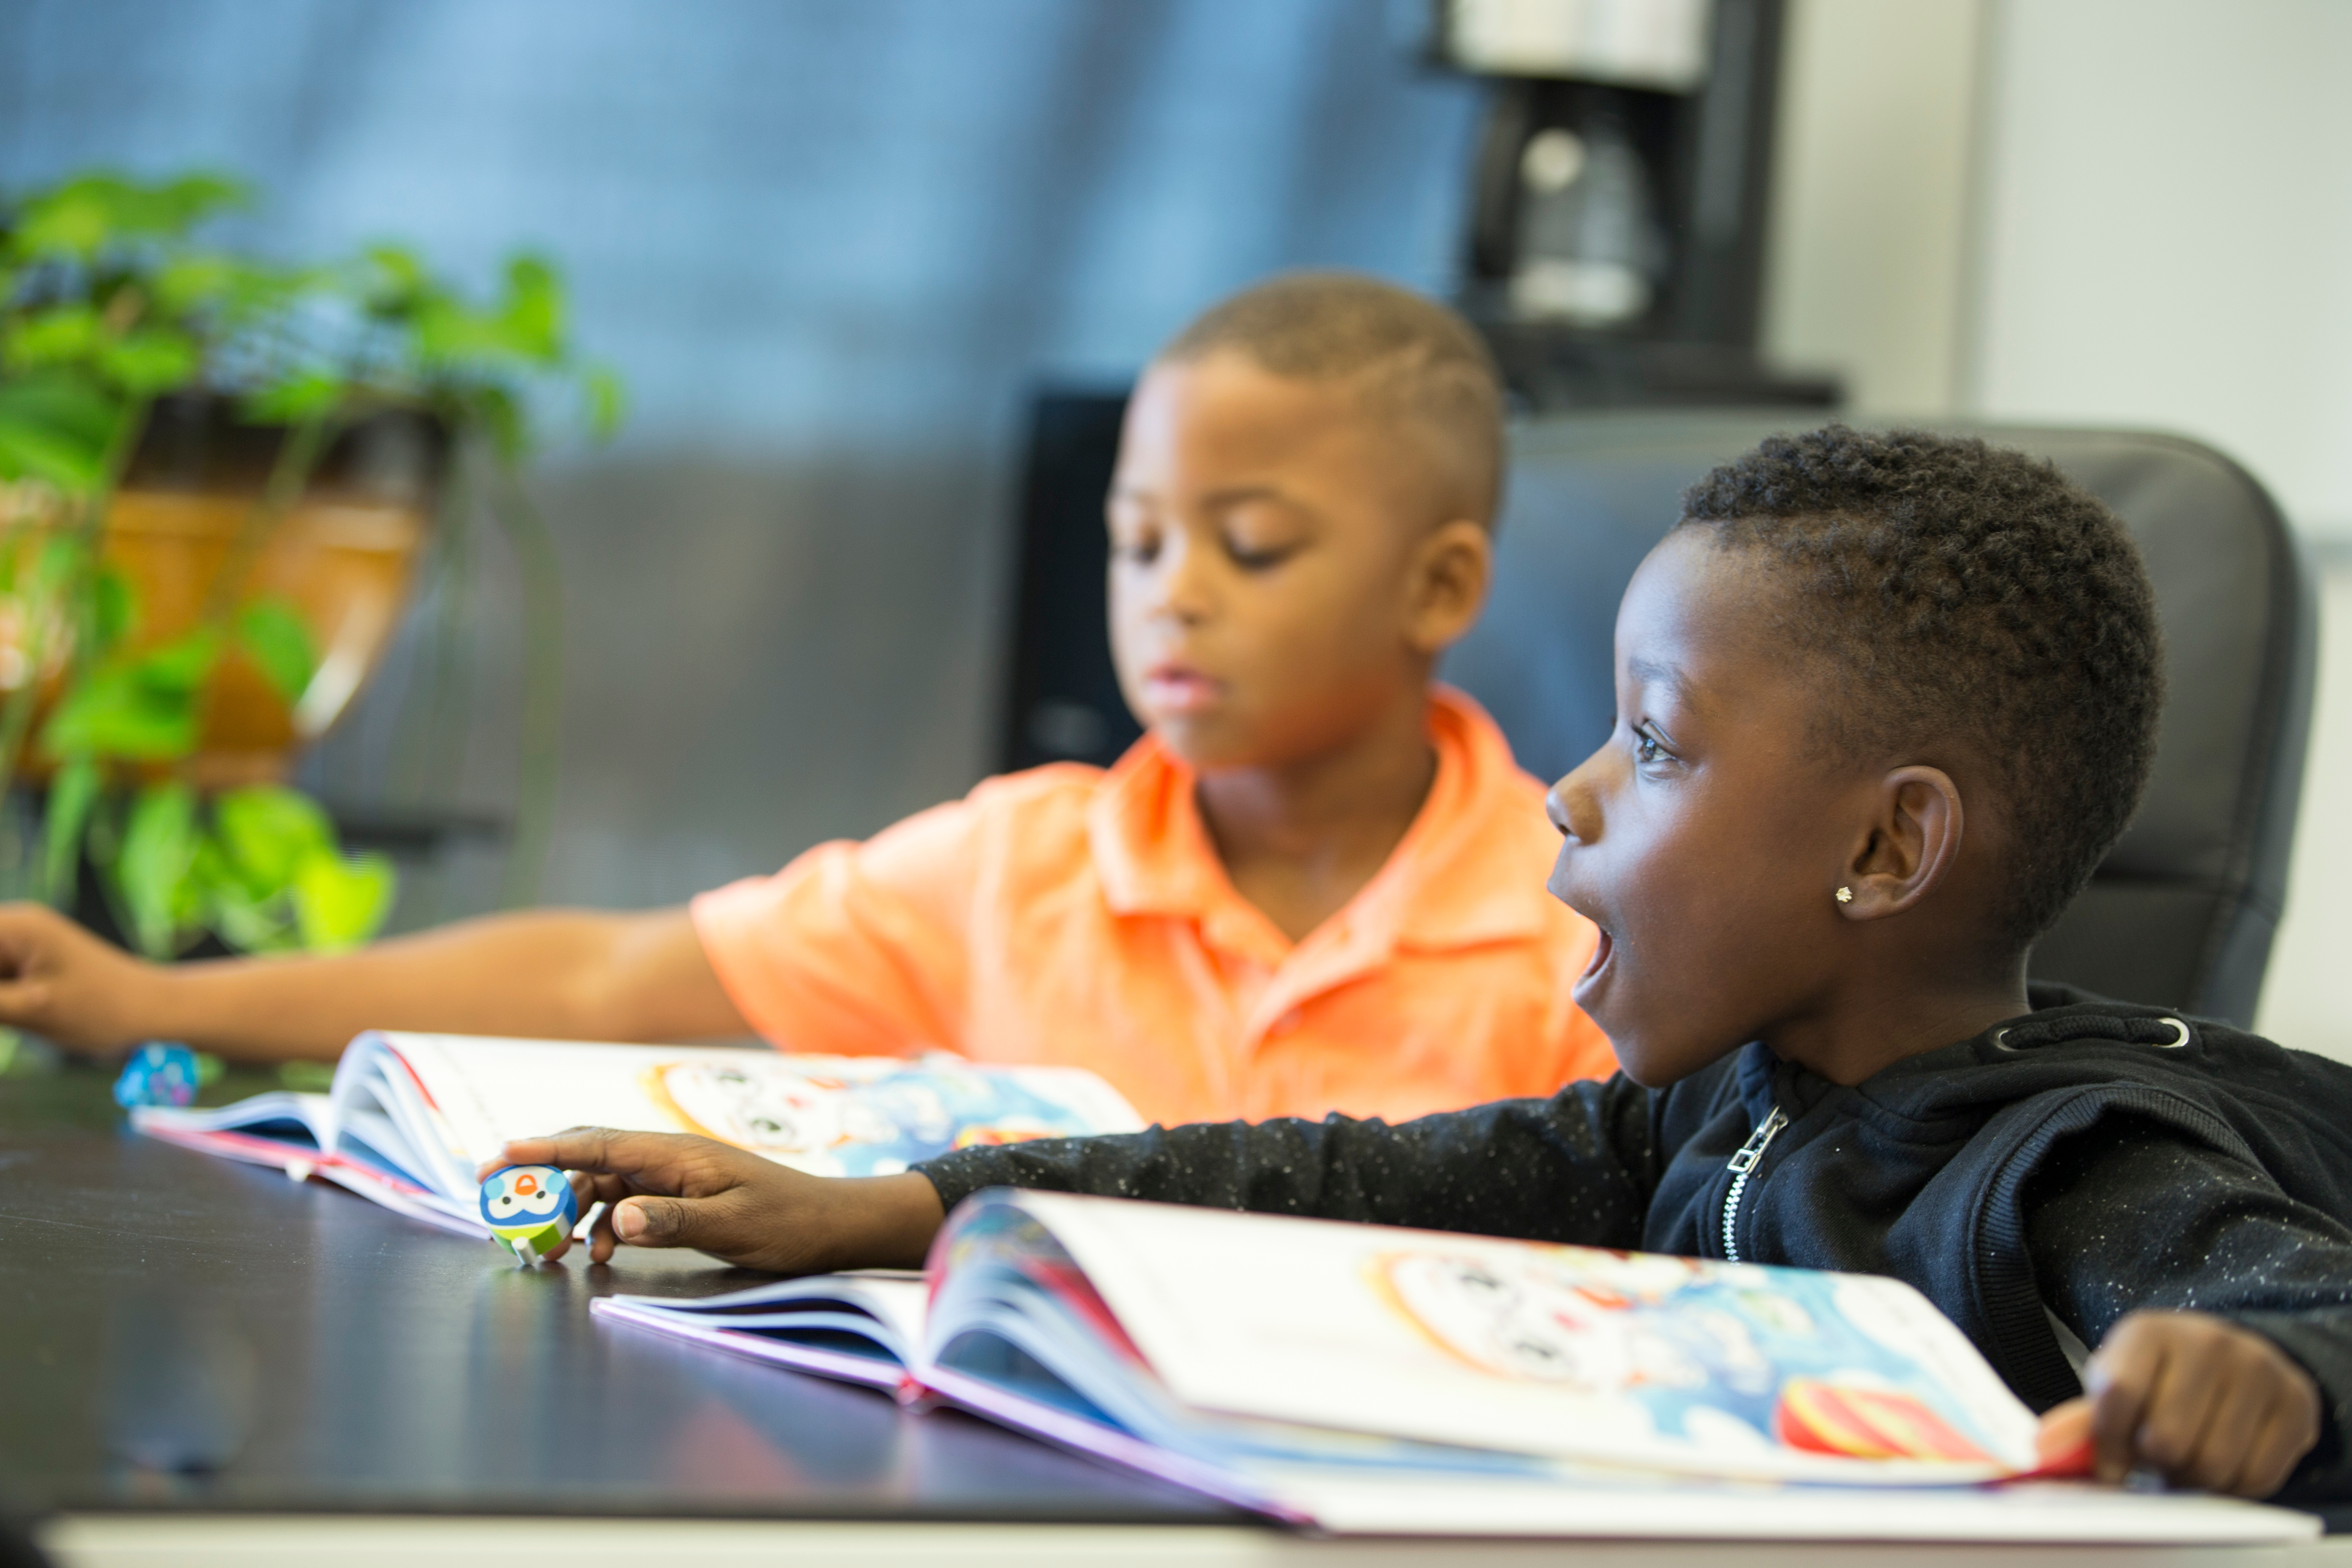 halifax learning spellread reading write learn reading program reading support tutor tutoring evidence-based education literacy